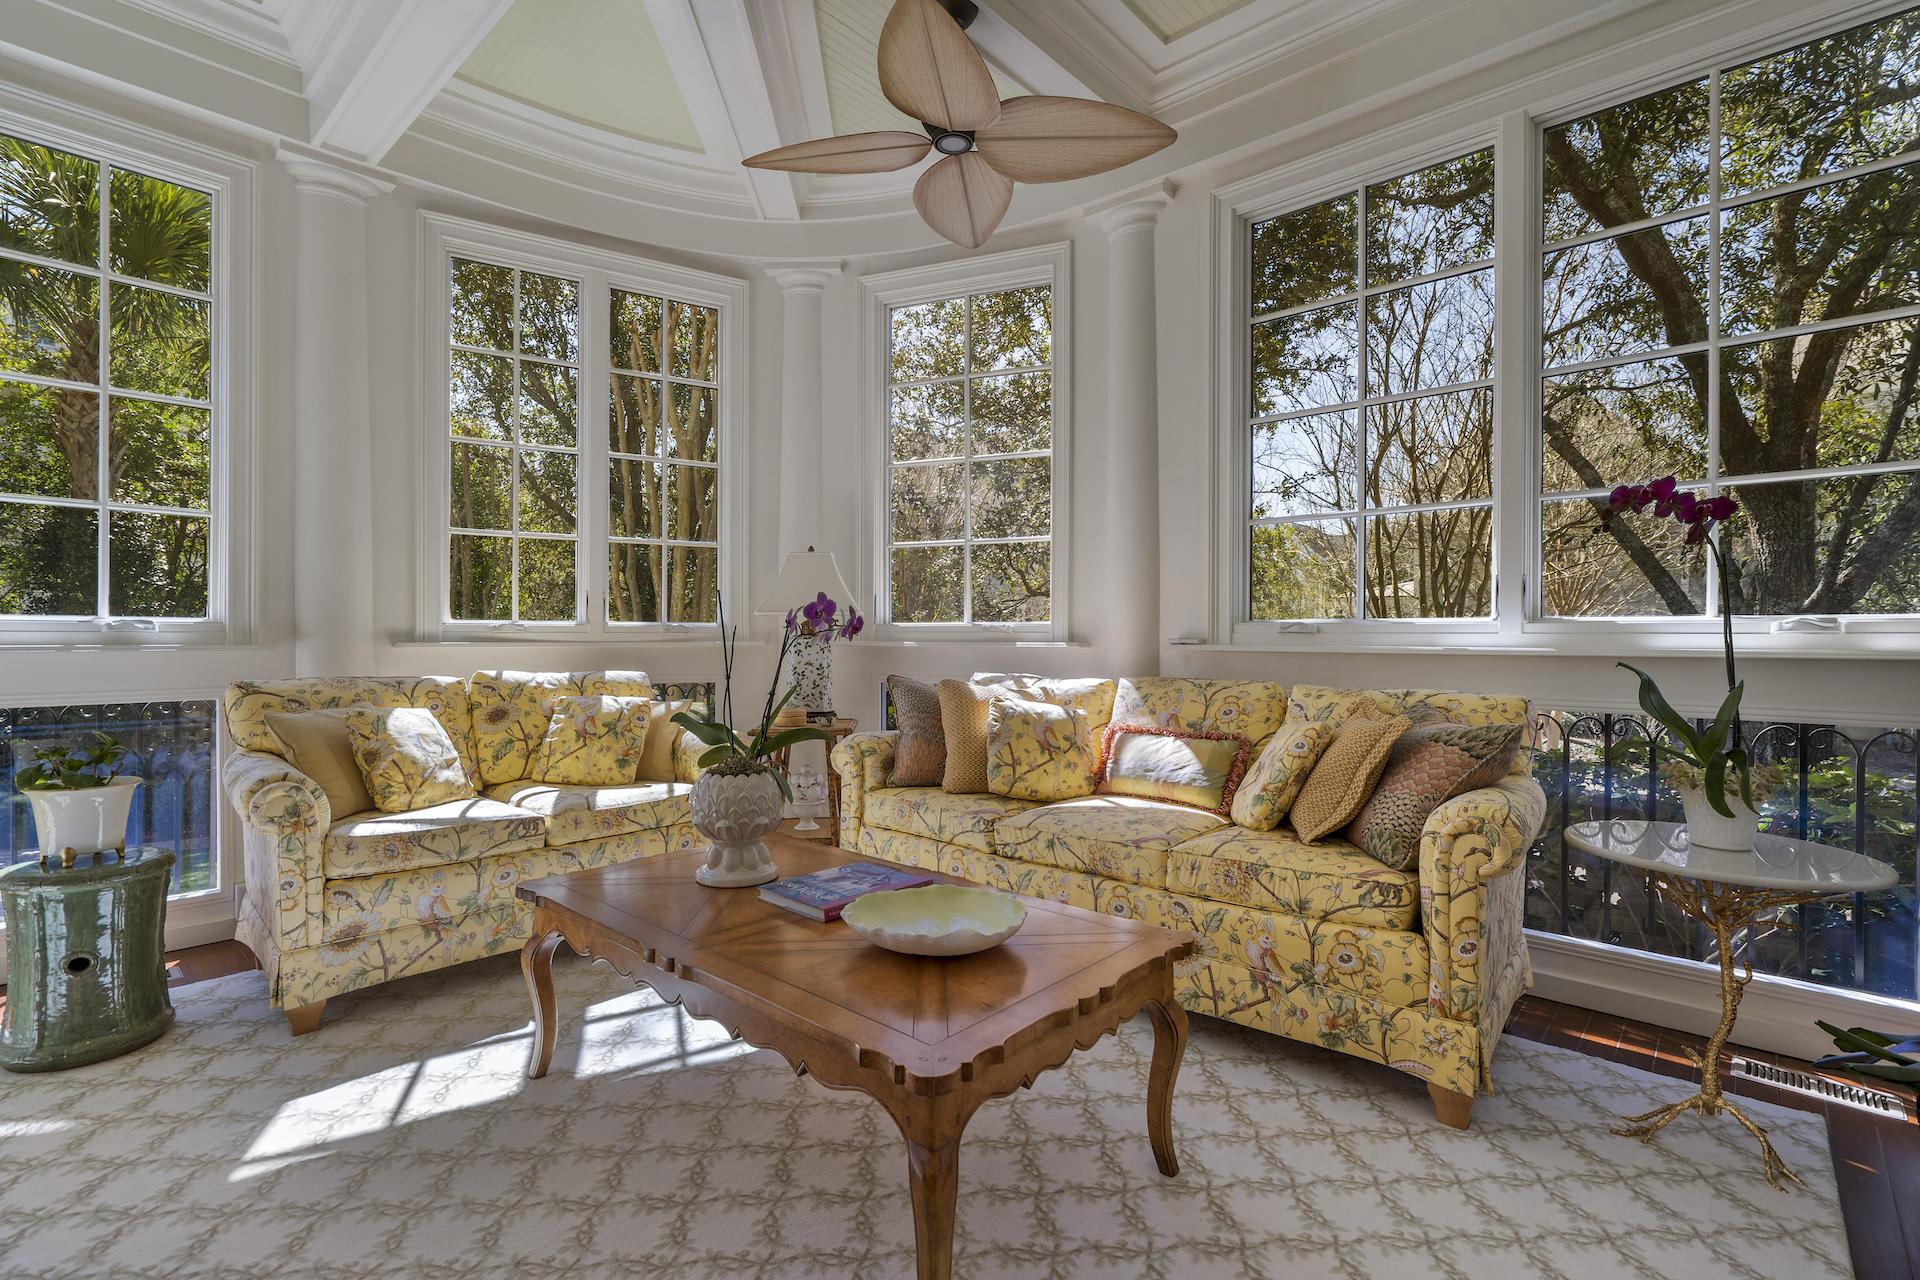 Daniel Island Homes For Sale - 623 Island Park, Charleston, SC - 45